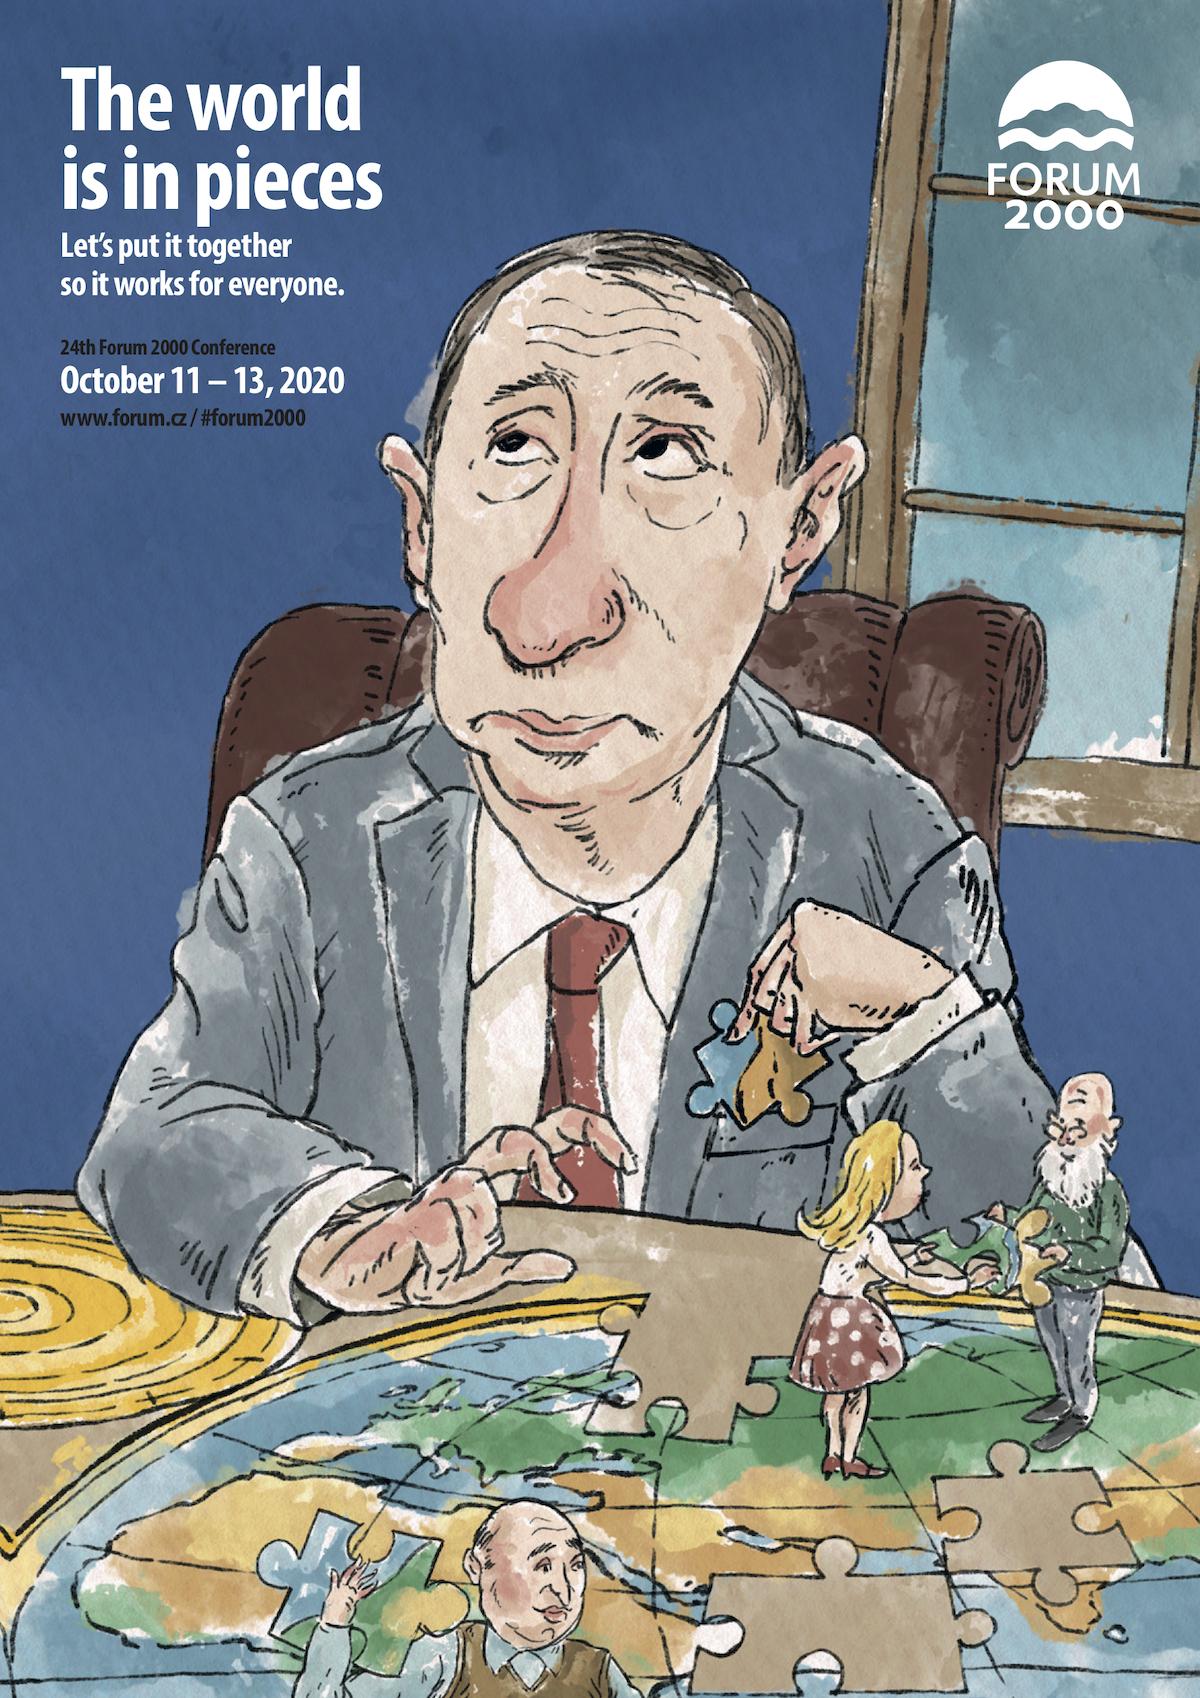 Vladimir Putin v kreslené kampani Fora 2000